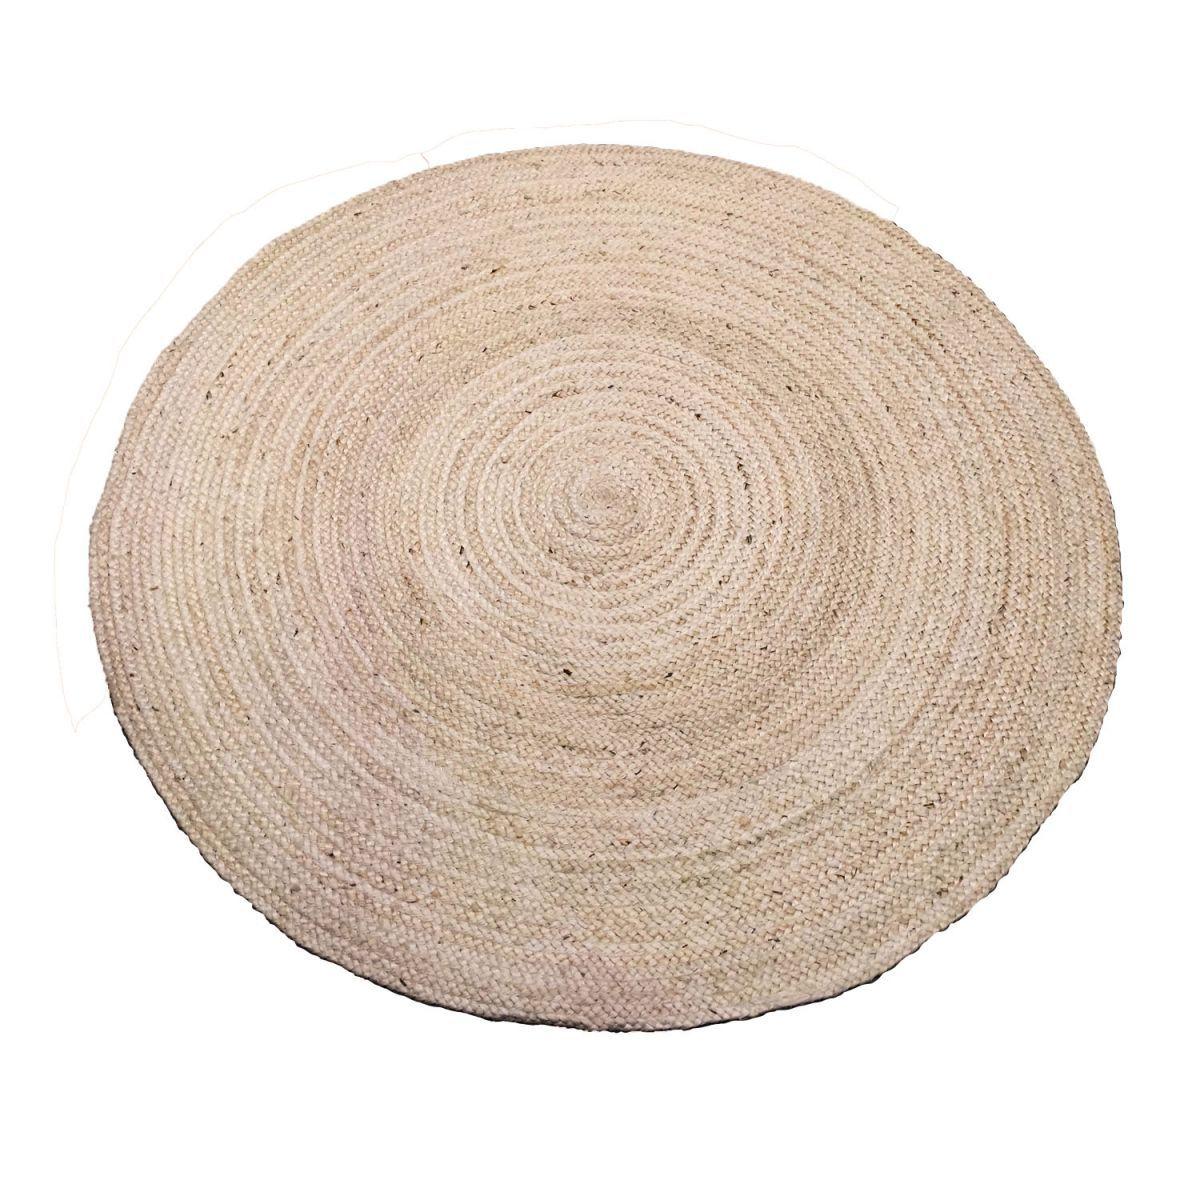 rug jute offwhite 120cm